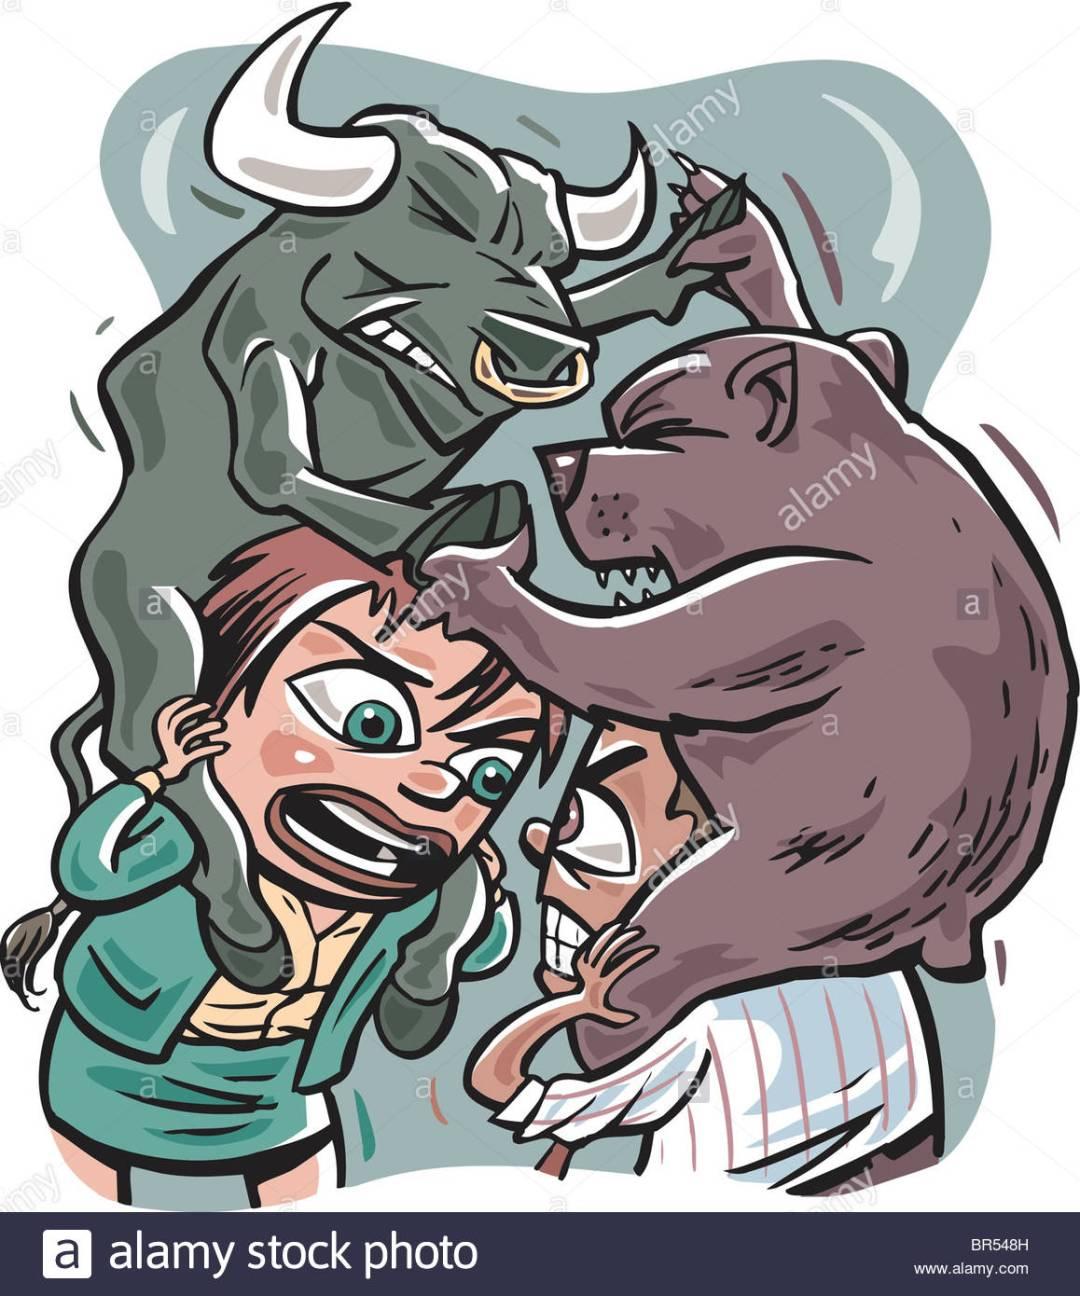 bull-vs-bear-BR548H